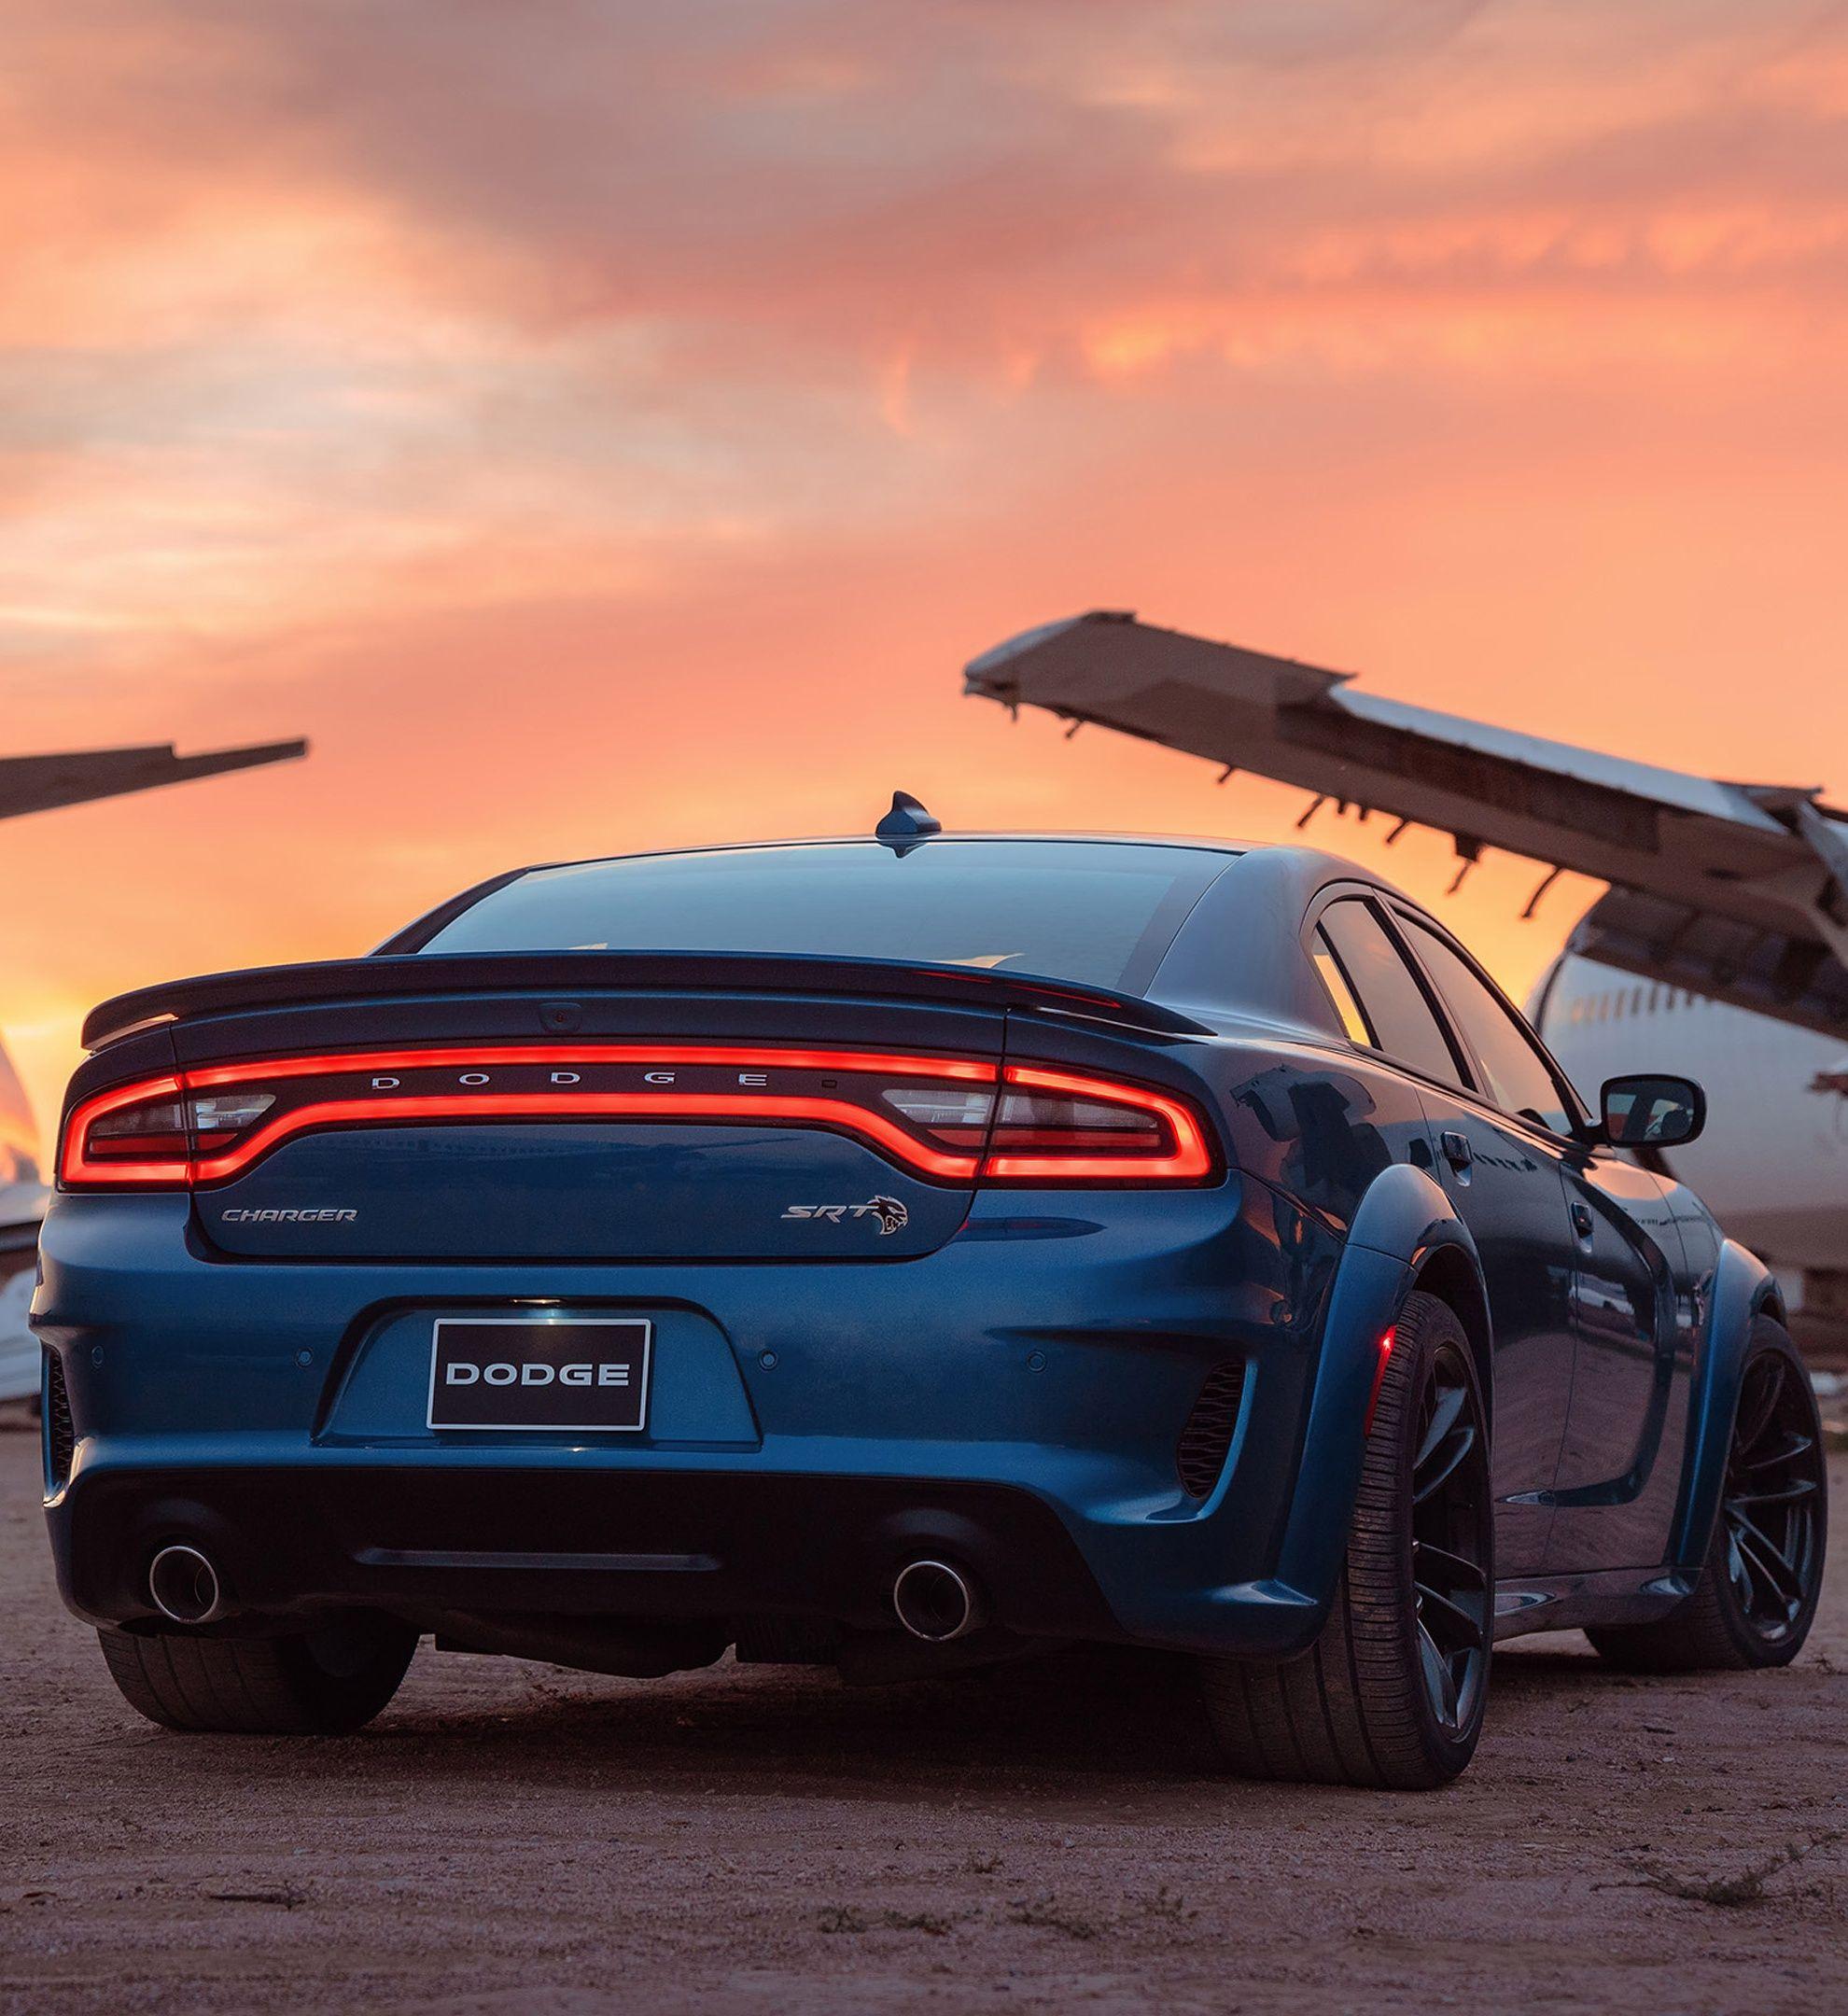 2020 Dodge Charger Srt Hellcat Widebody Charger Srt Hellcat Dodge Charger Srt Dodge Charger